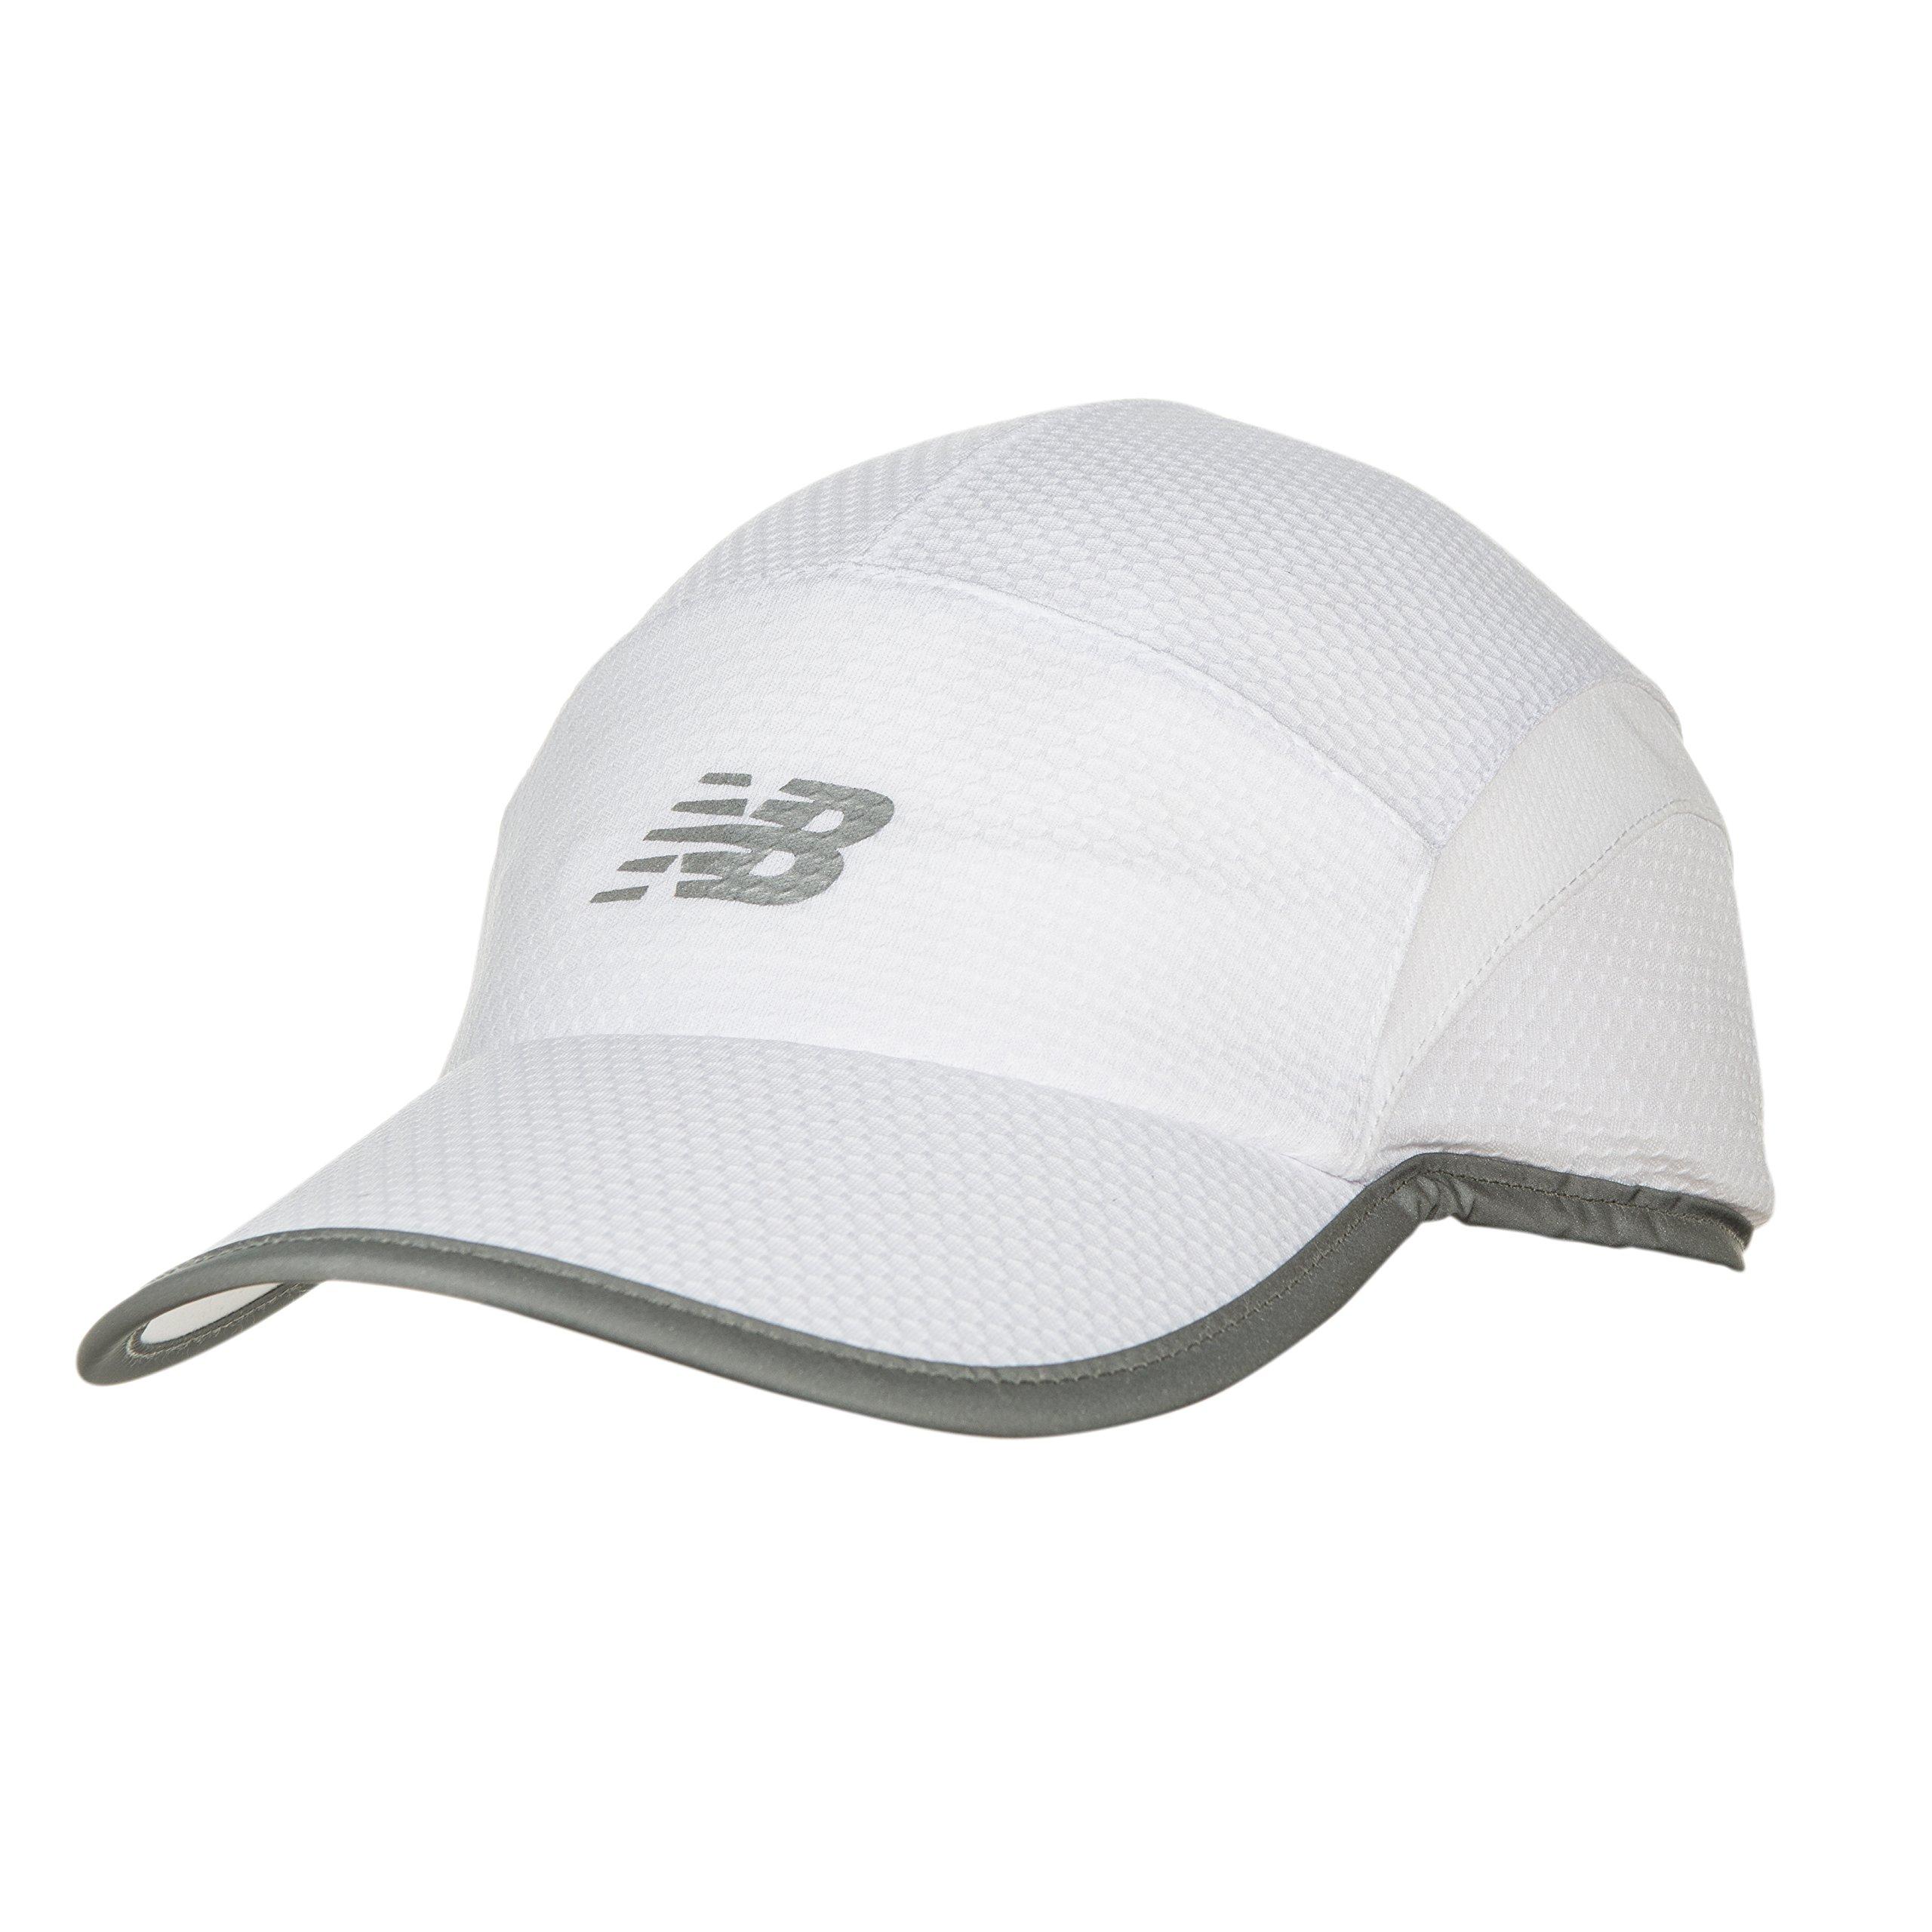 New Balance 5 Panel Performance Hat, White, One Size